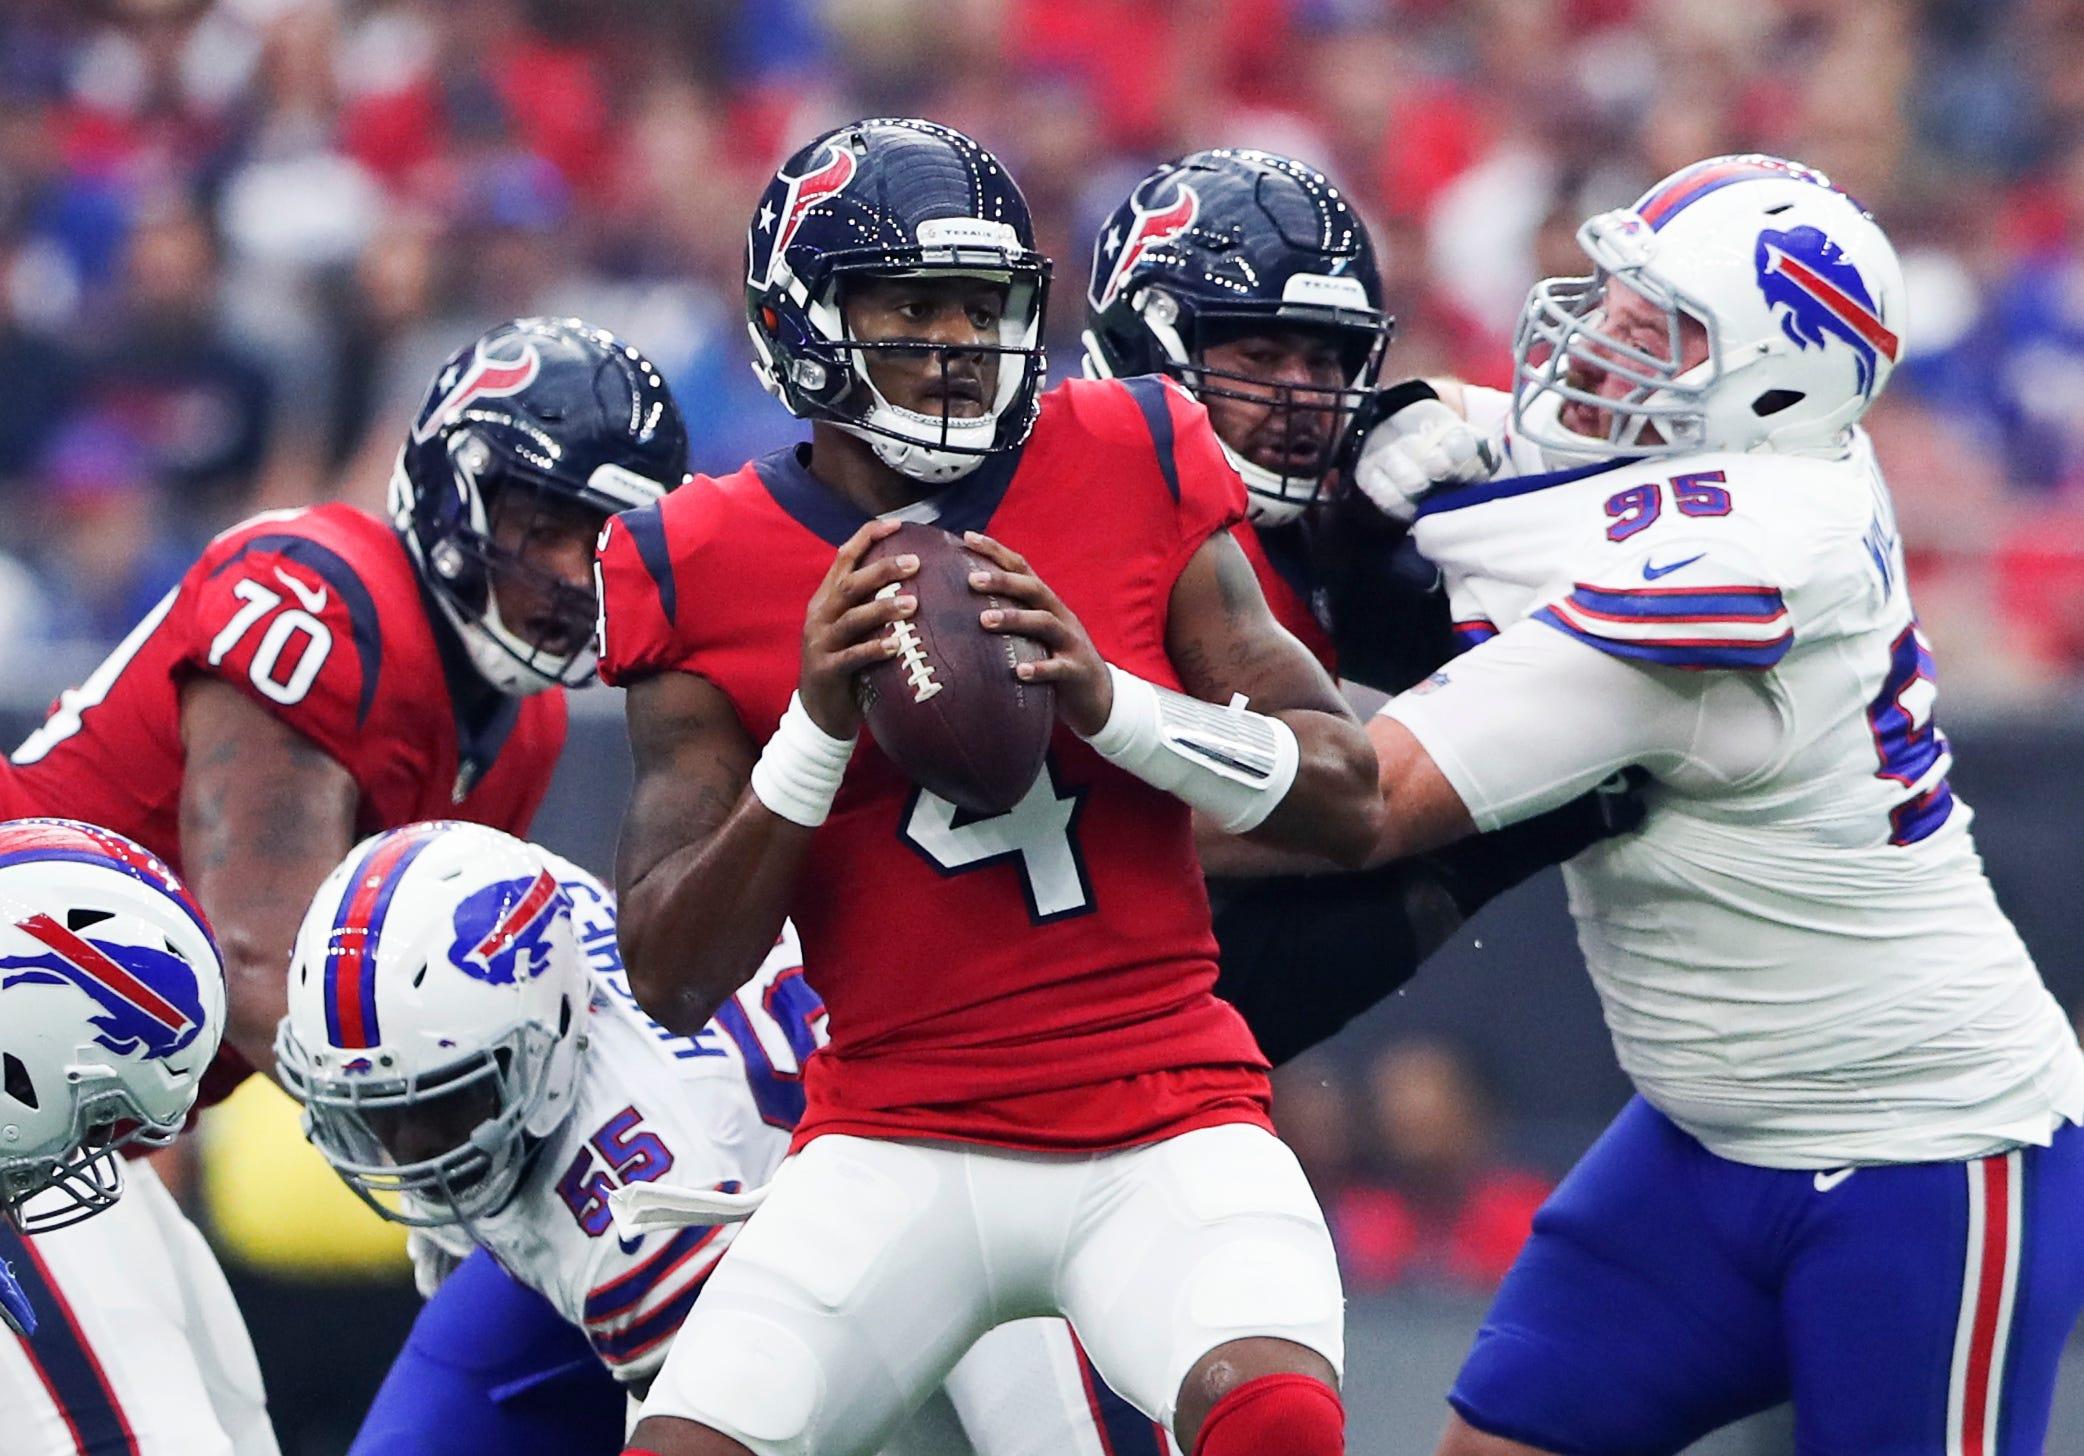 Nfl Buffalo Bills At Houston Texans